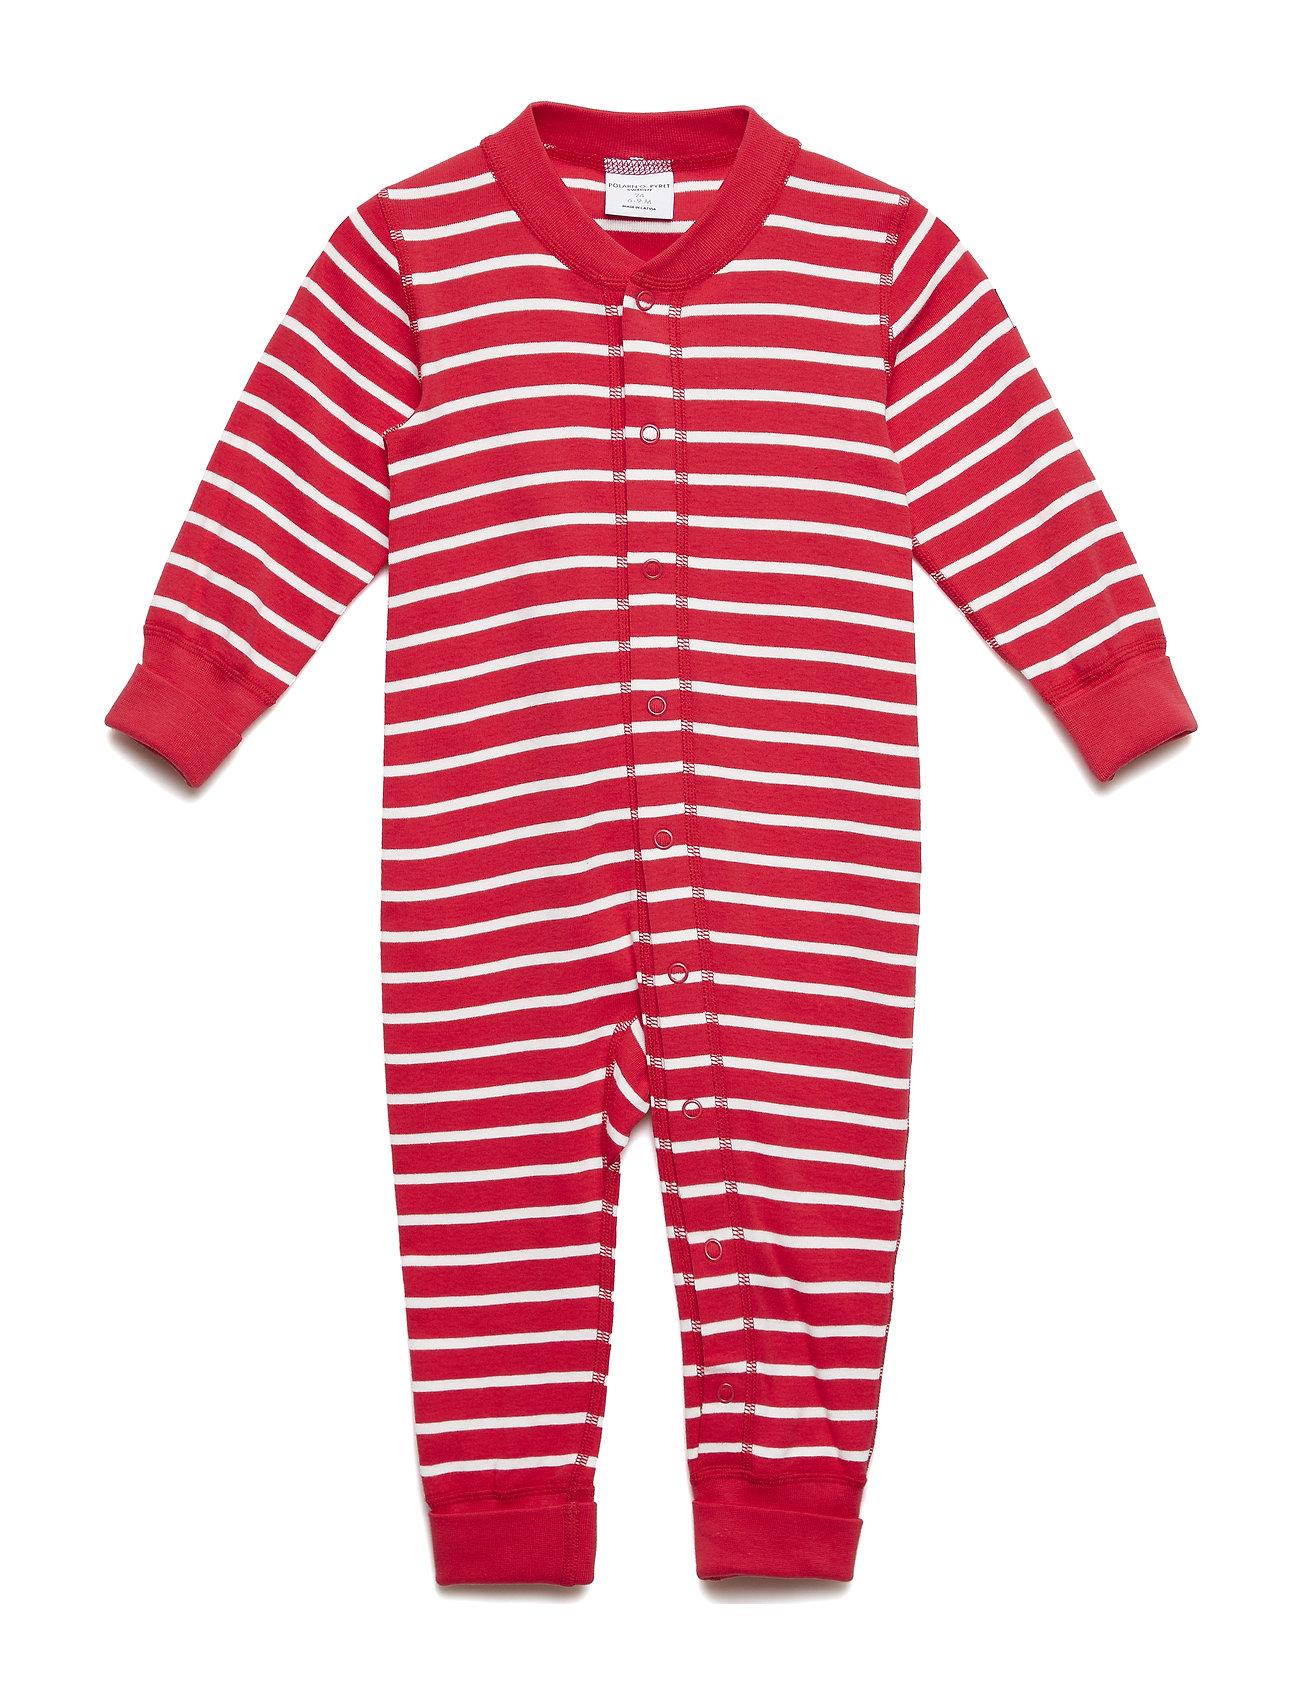 Polarn O. Pyret Overall PO.P Stripe Baby - SKI PATROL